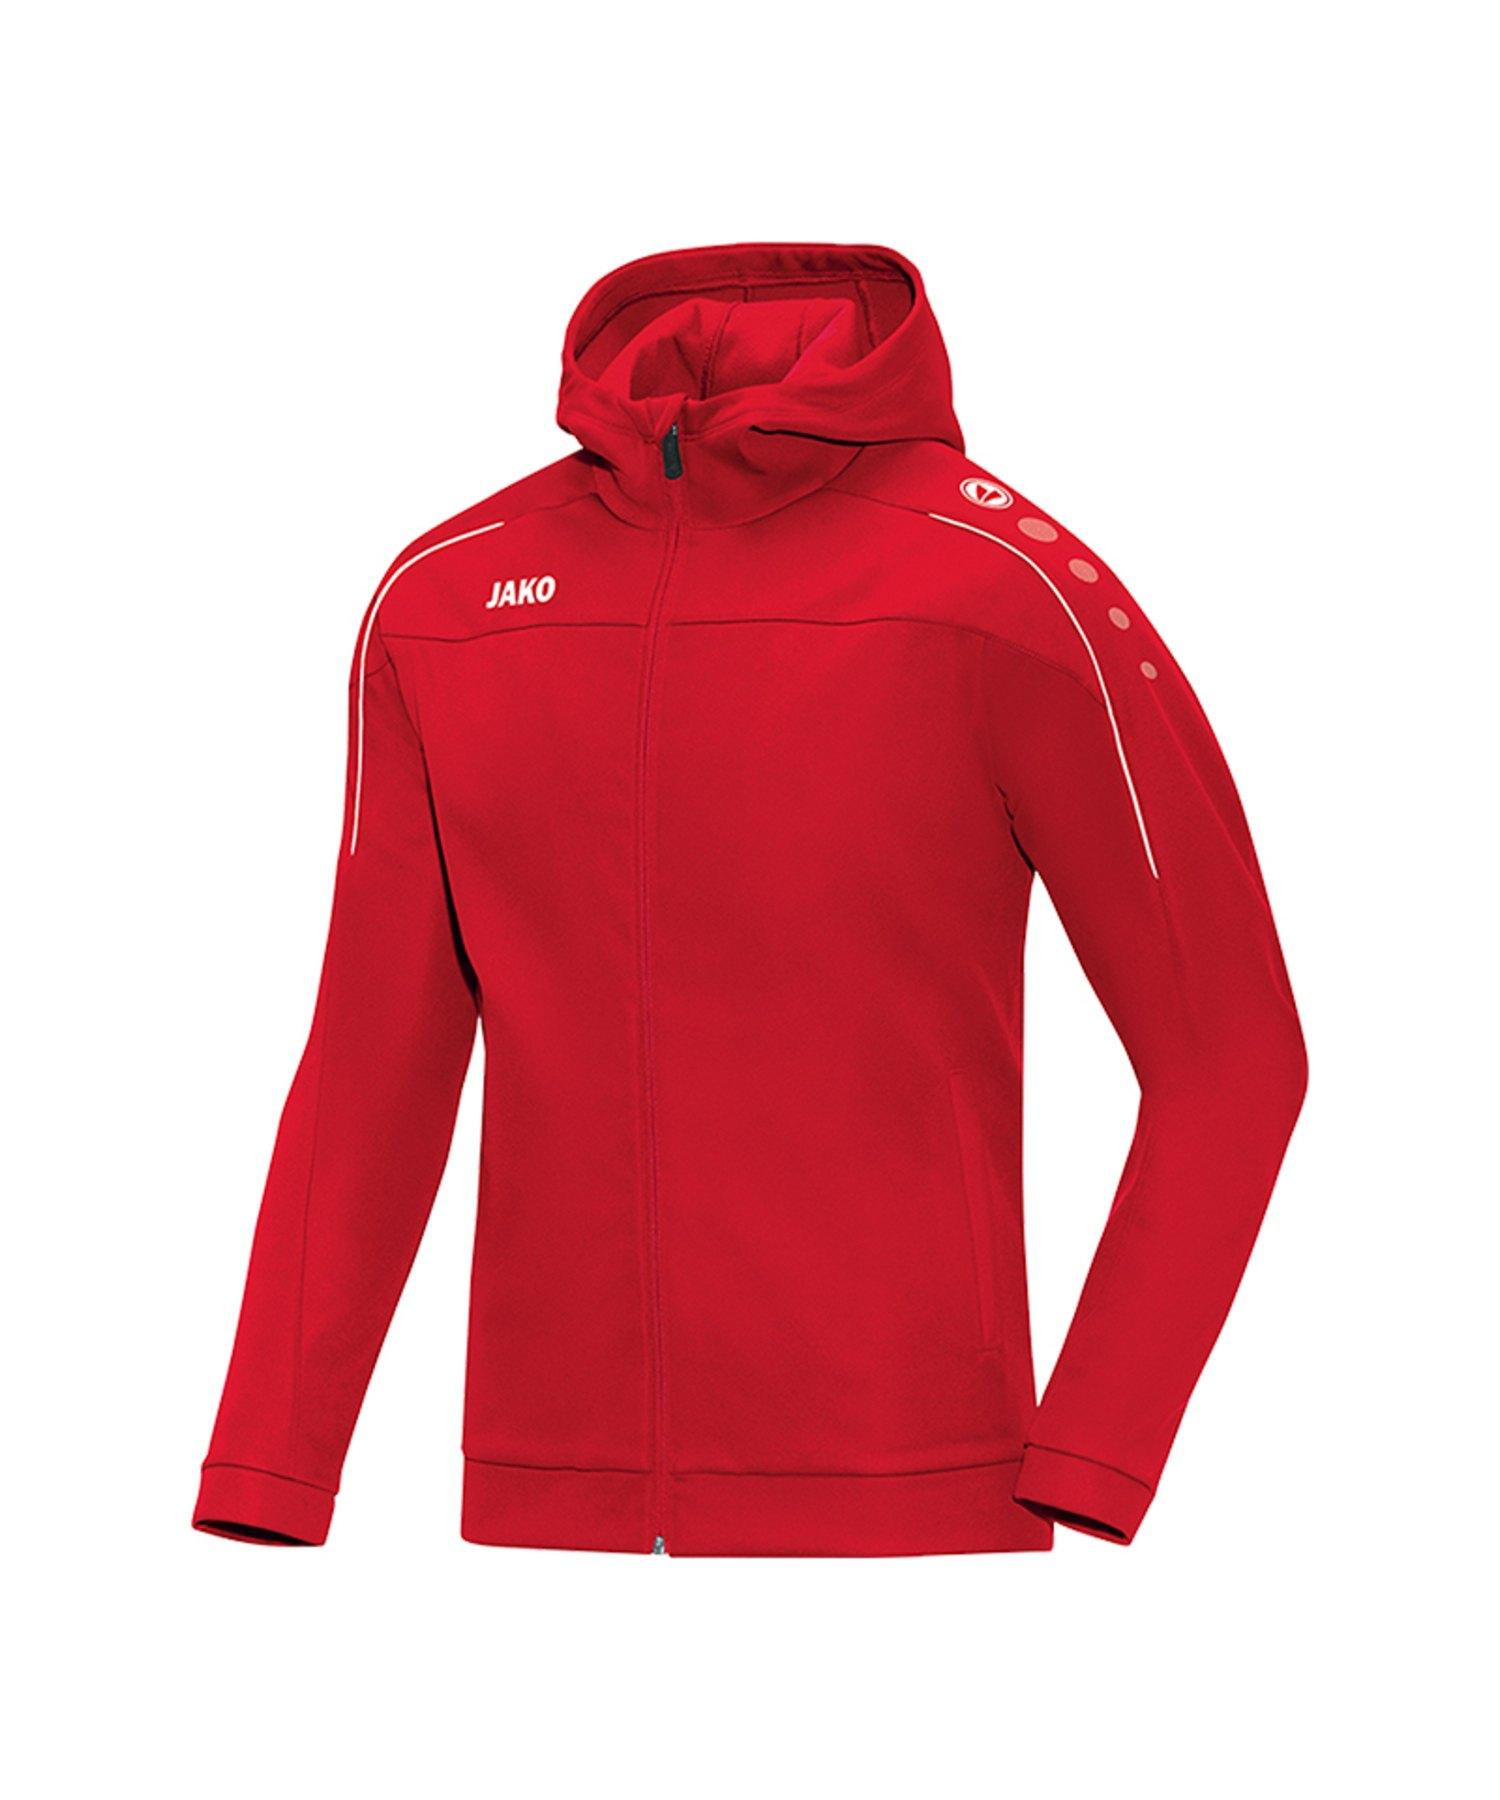 Jako Classico Kapuzenjacke Damen Rot F01 - Rot